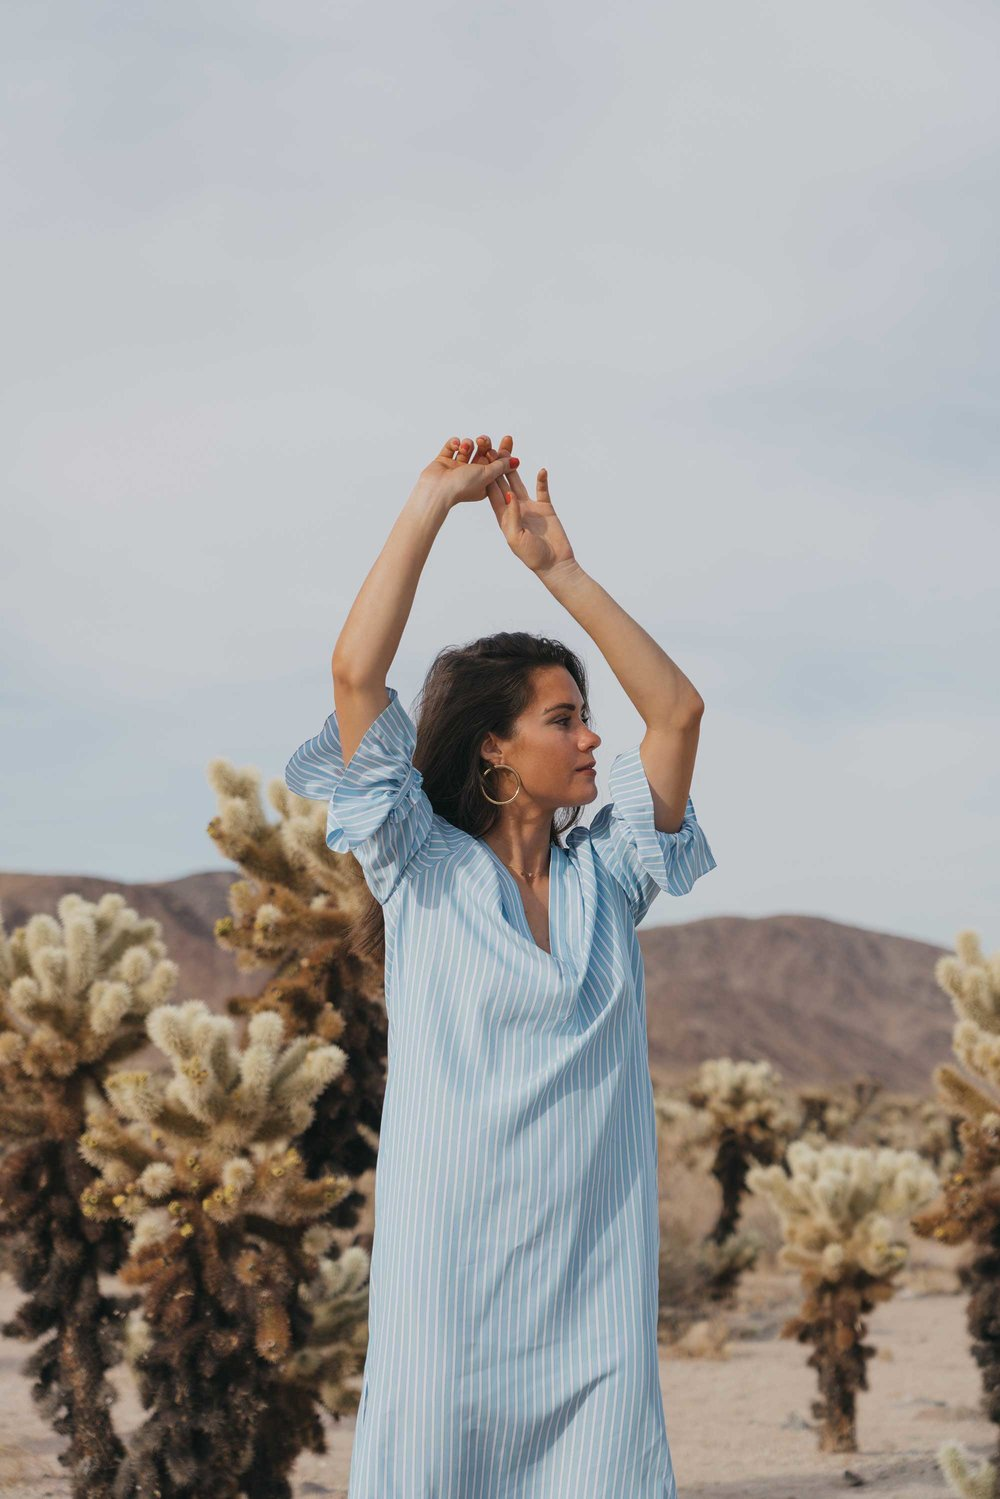 Frill Sleeve Maxi Shirt Dress Festival Outfit Coachella Joshua Tree Cholla Cactus Garden20.jpg